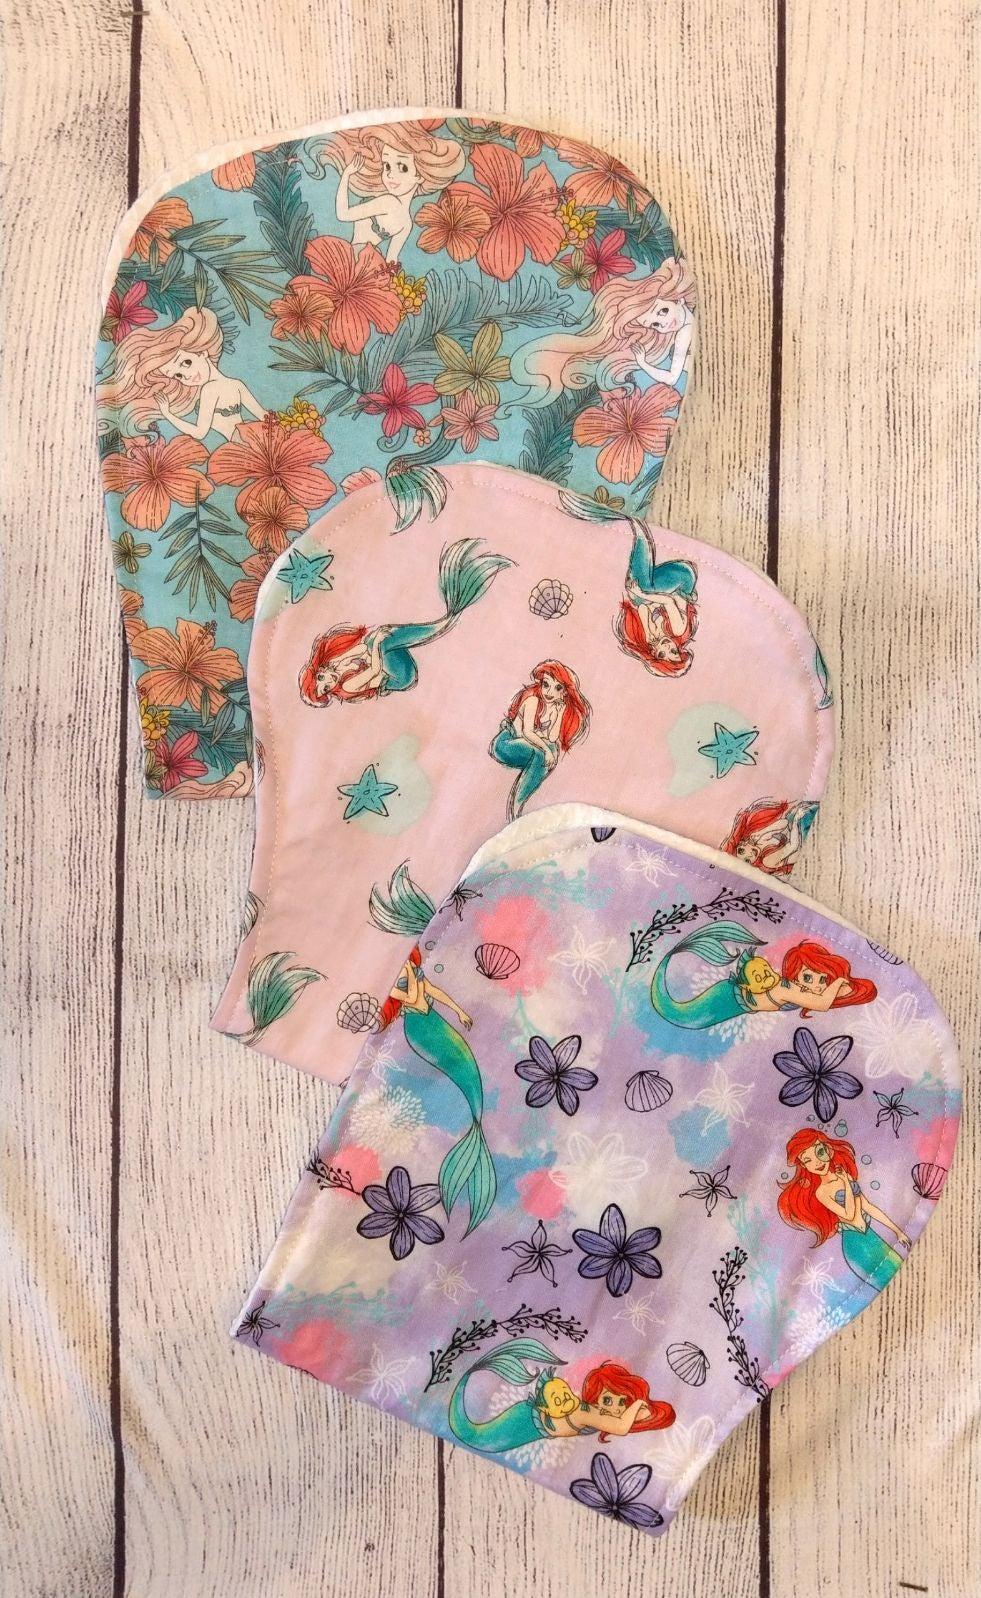 Disney little mermaid baby burp cloths